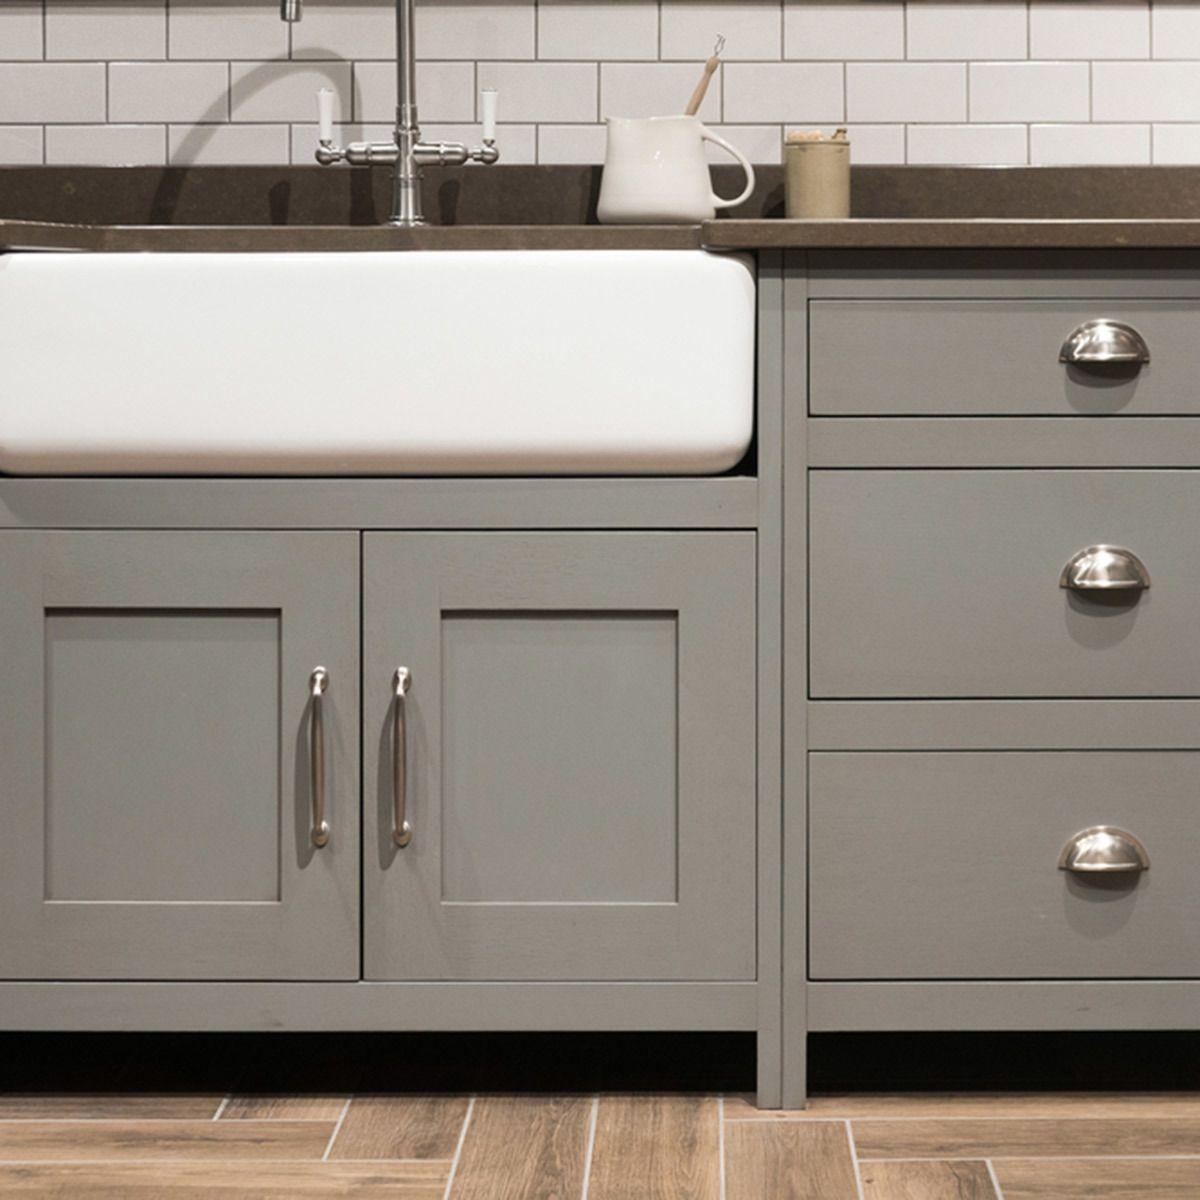 Two Ways To Plumb An Island Sink Beautiful Kitchen Cabinets Kitchen Cabinet Colors Kitchen Cabinet Trends